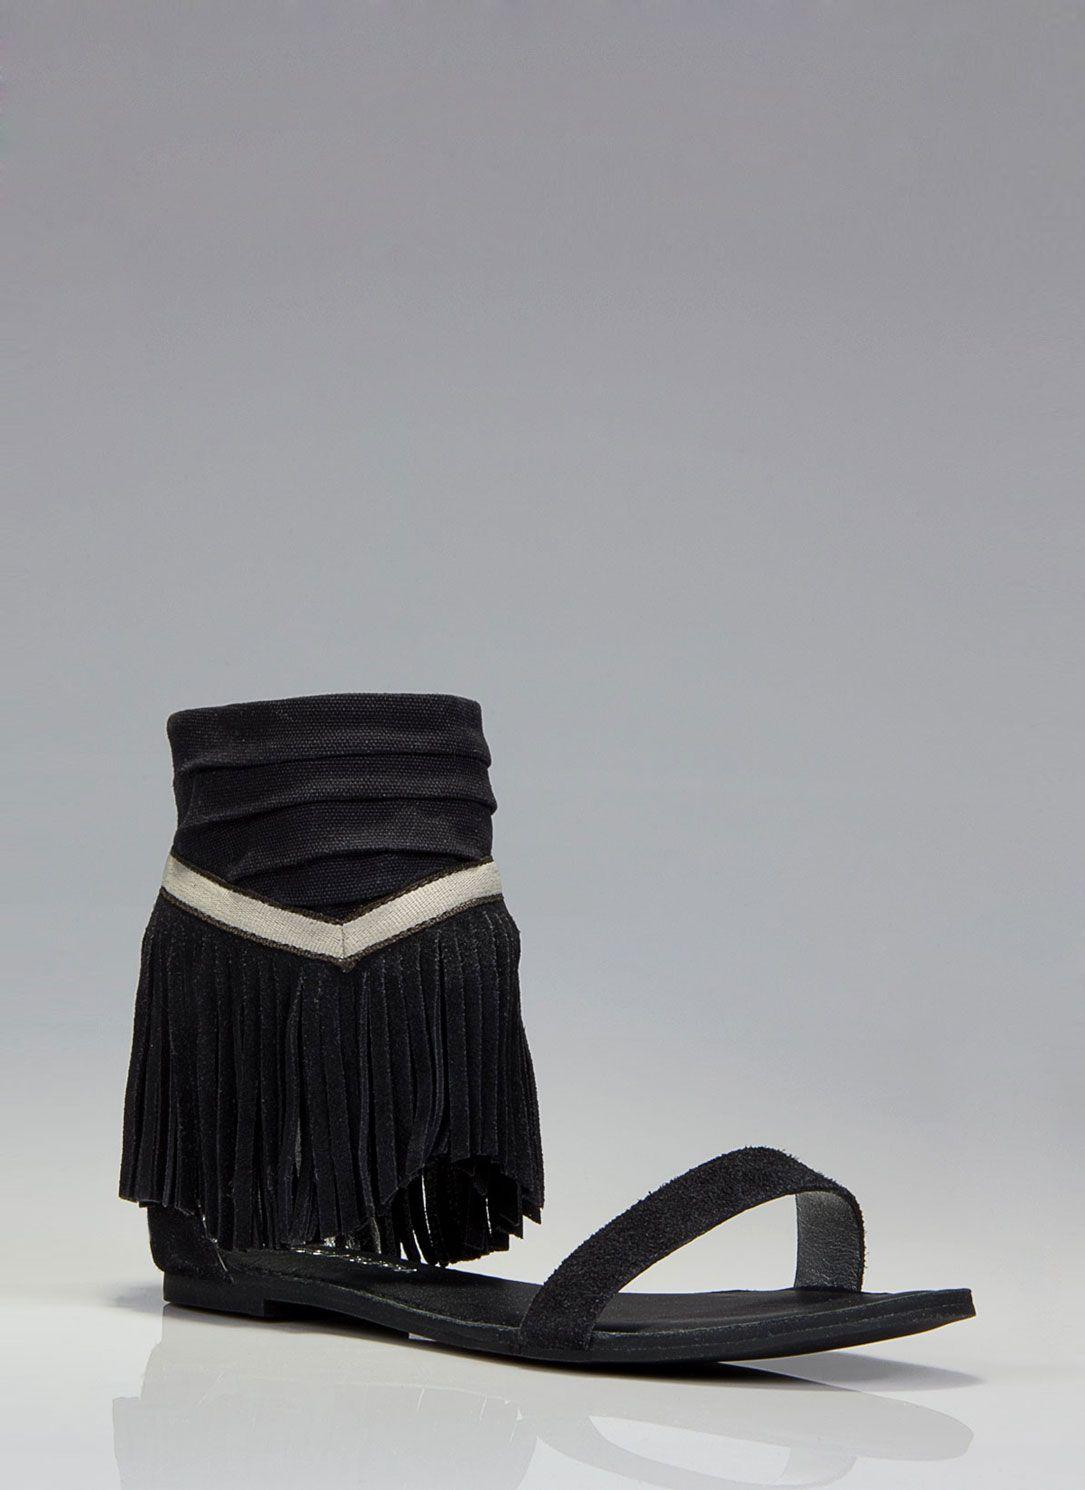 97ce517d7b3 Koolaburra Zola sandal.   ~。*:☆fashion:beauty゜☆。~   Gladiator ...